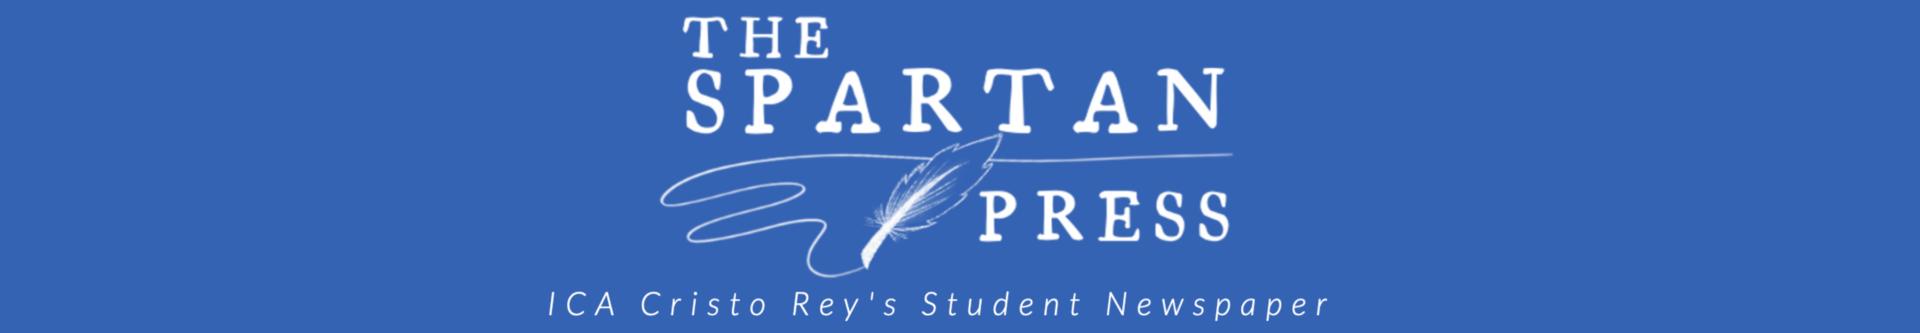 ICA Crisot Rey student Newspaper